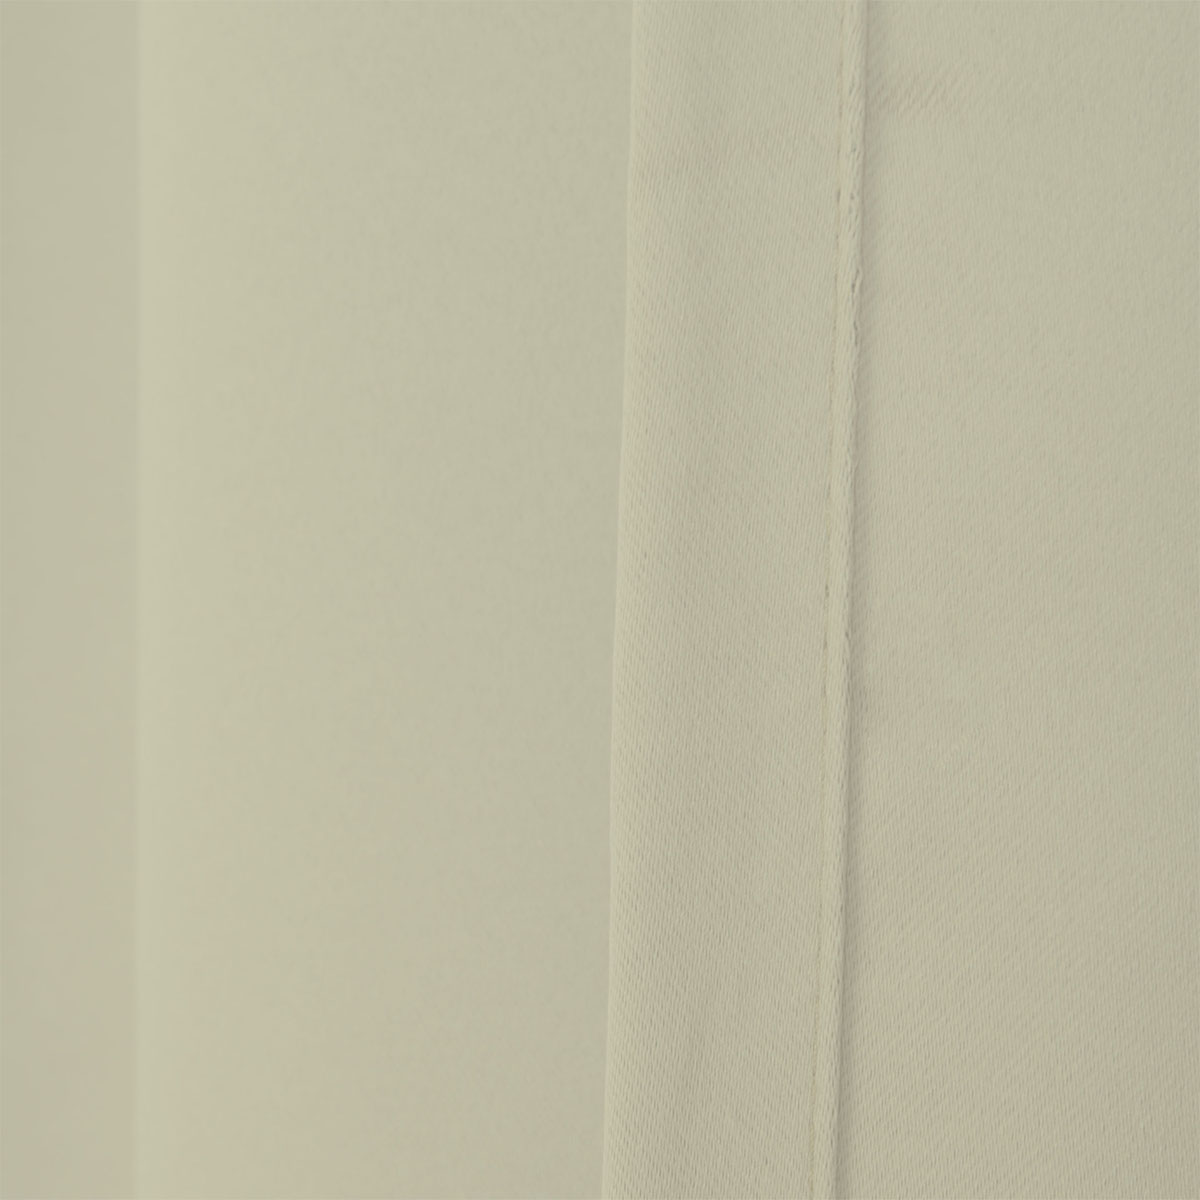 thermo vorhang kr uselband blackout uni beige ca 140x245cm blickdicht. Black Bedroom Furniture Sets. Home Design Ideas